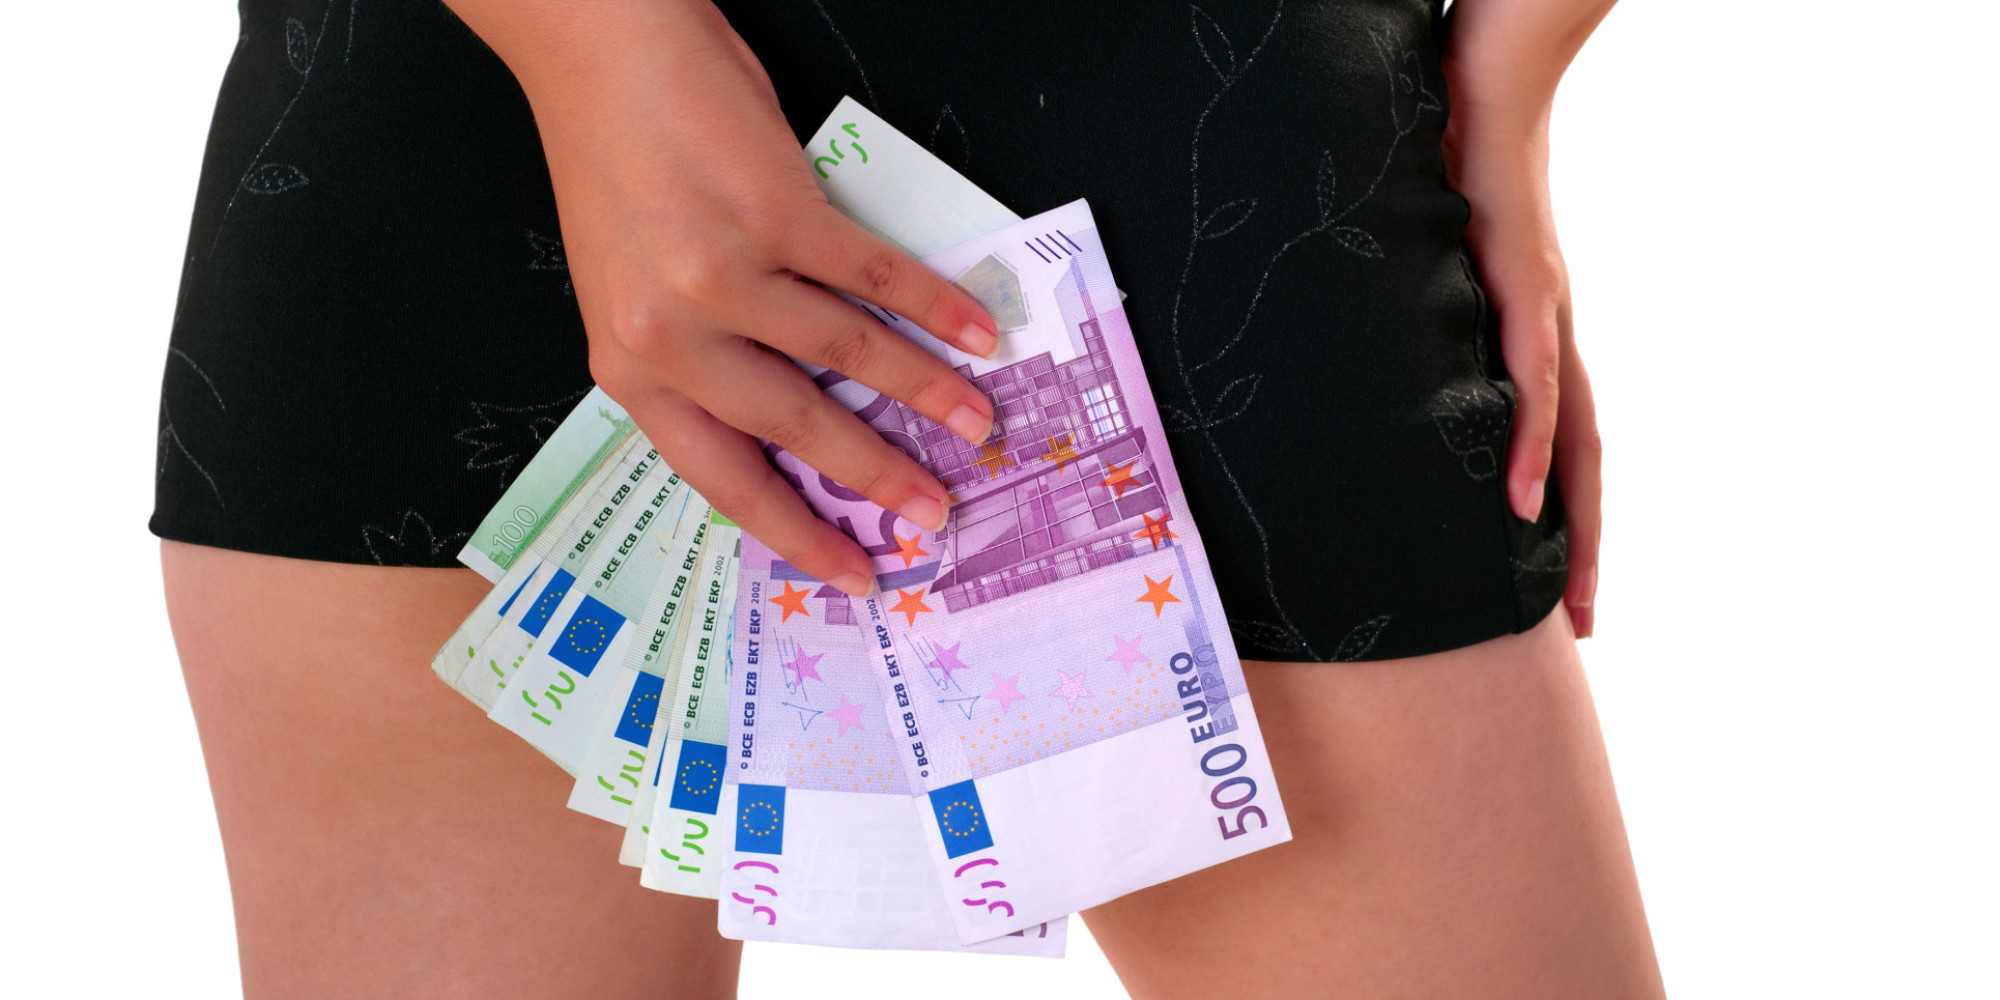 podemos prostitución adiccion a prostitutas